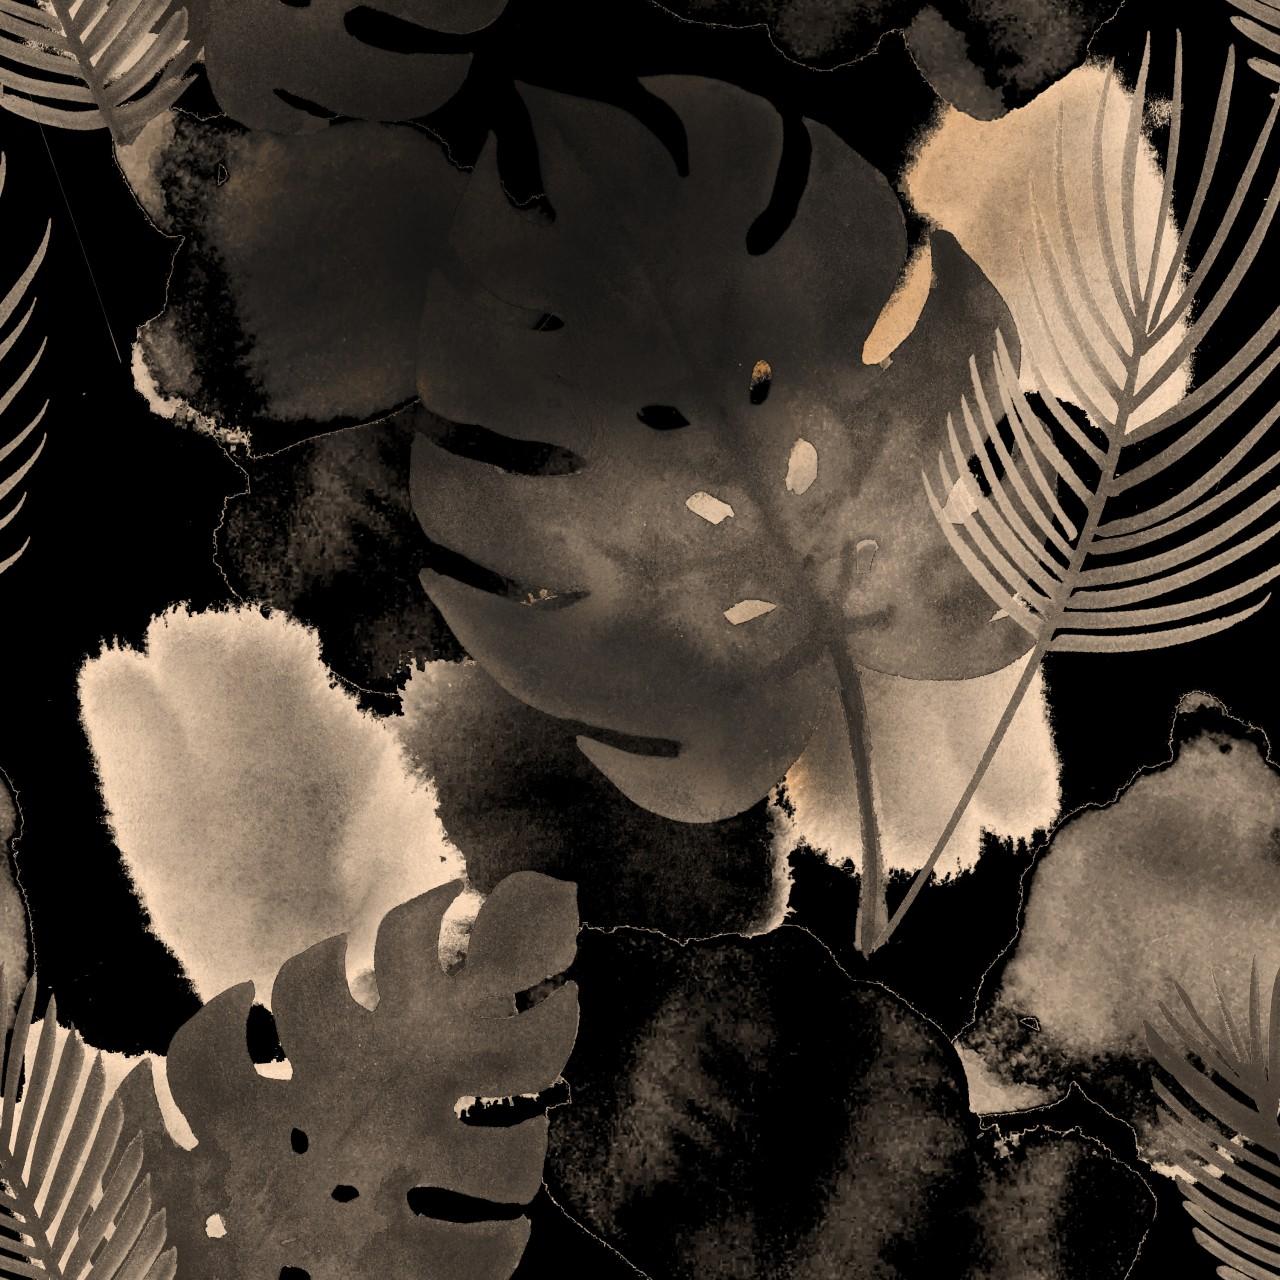 Jesienna-chandra